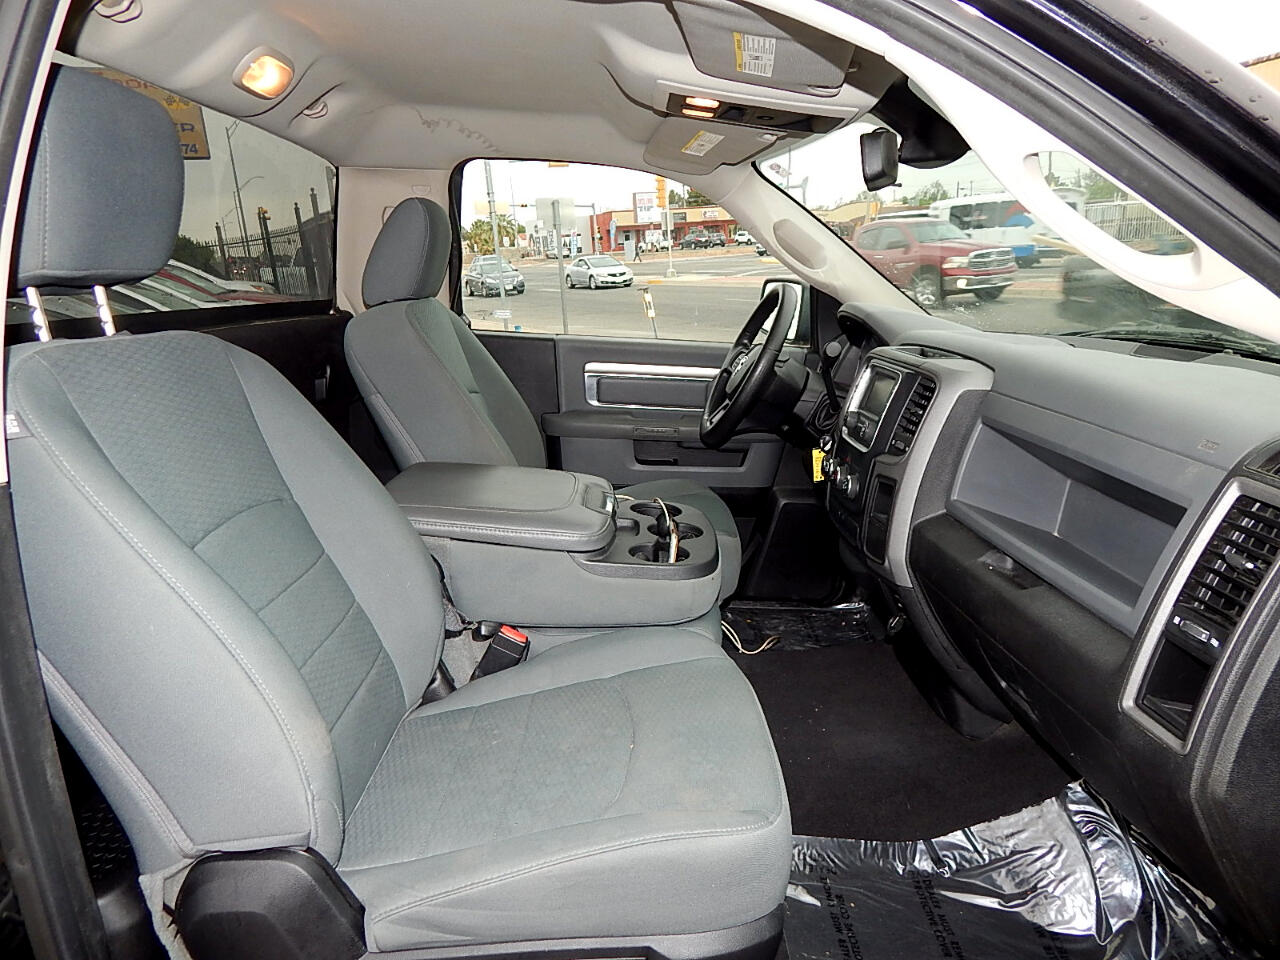 2014 RAM 1500 Express Regular Cab SWB 4WD